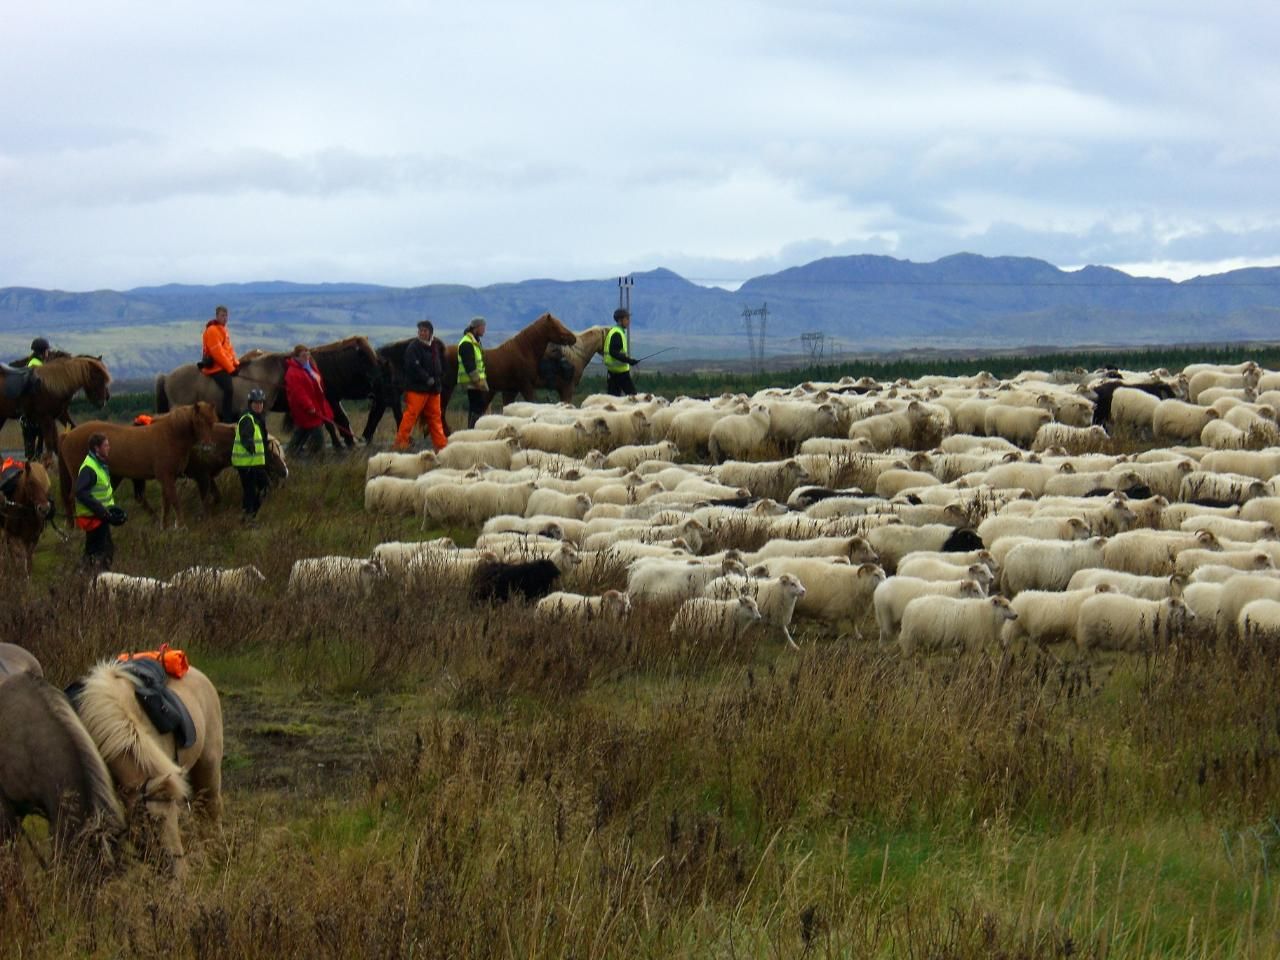 Sheep round up - Melrakkaslétta